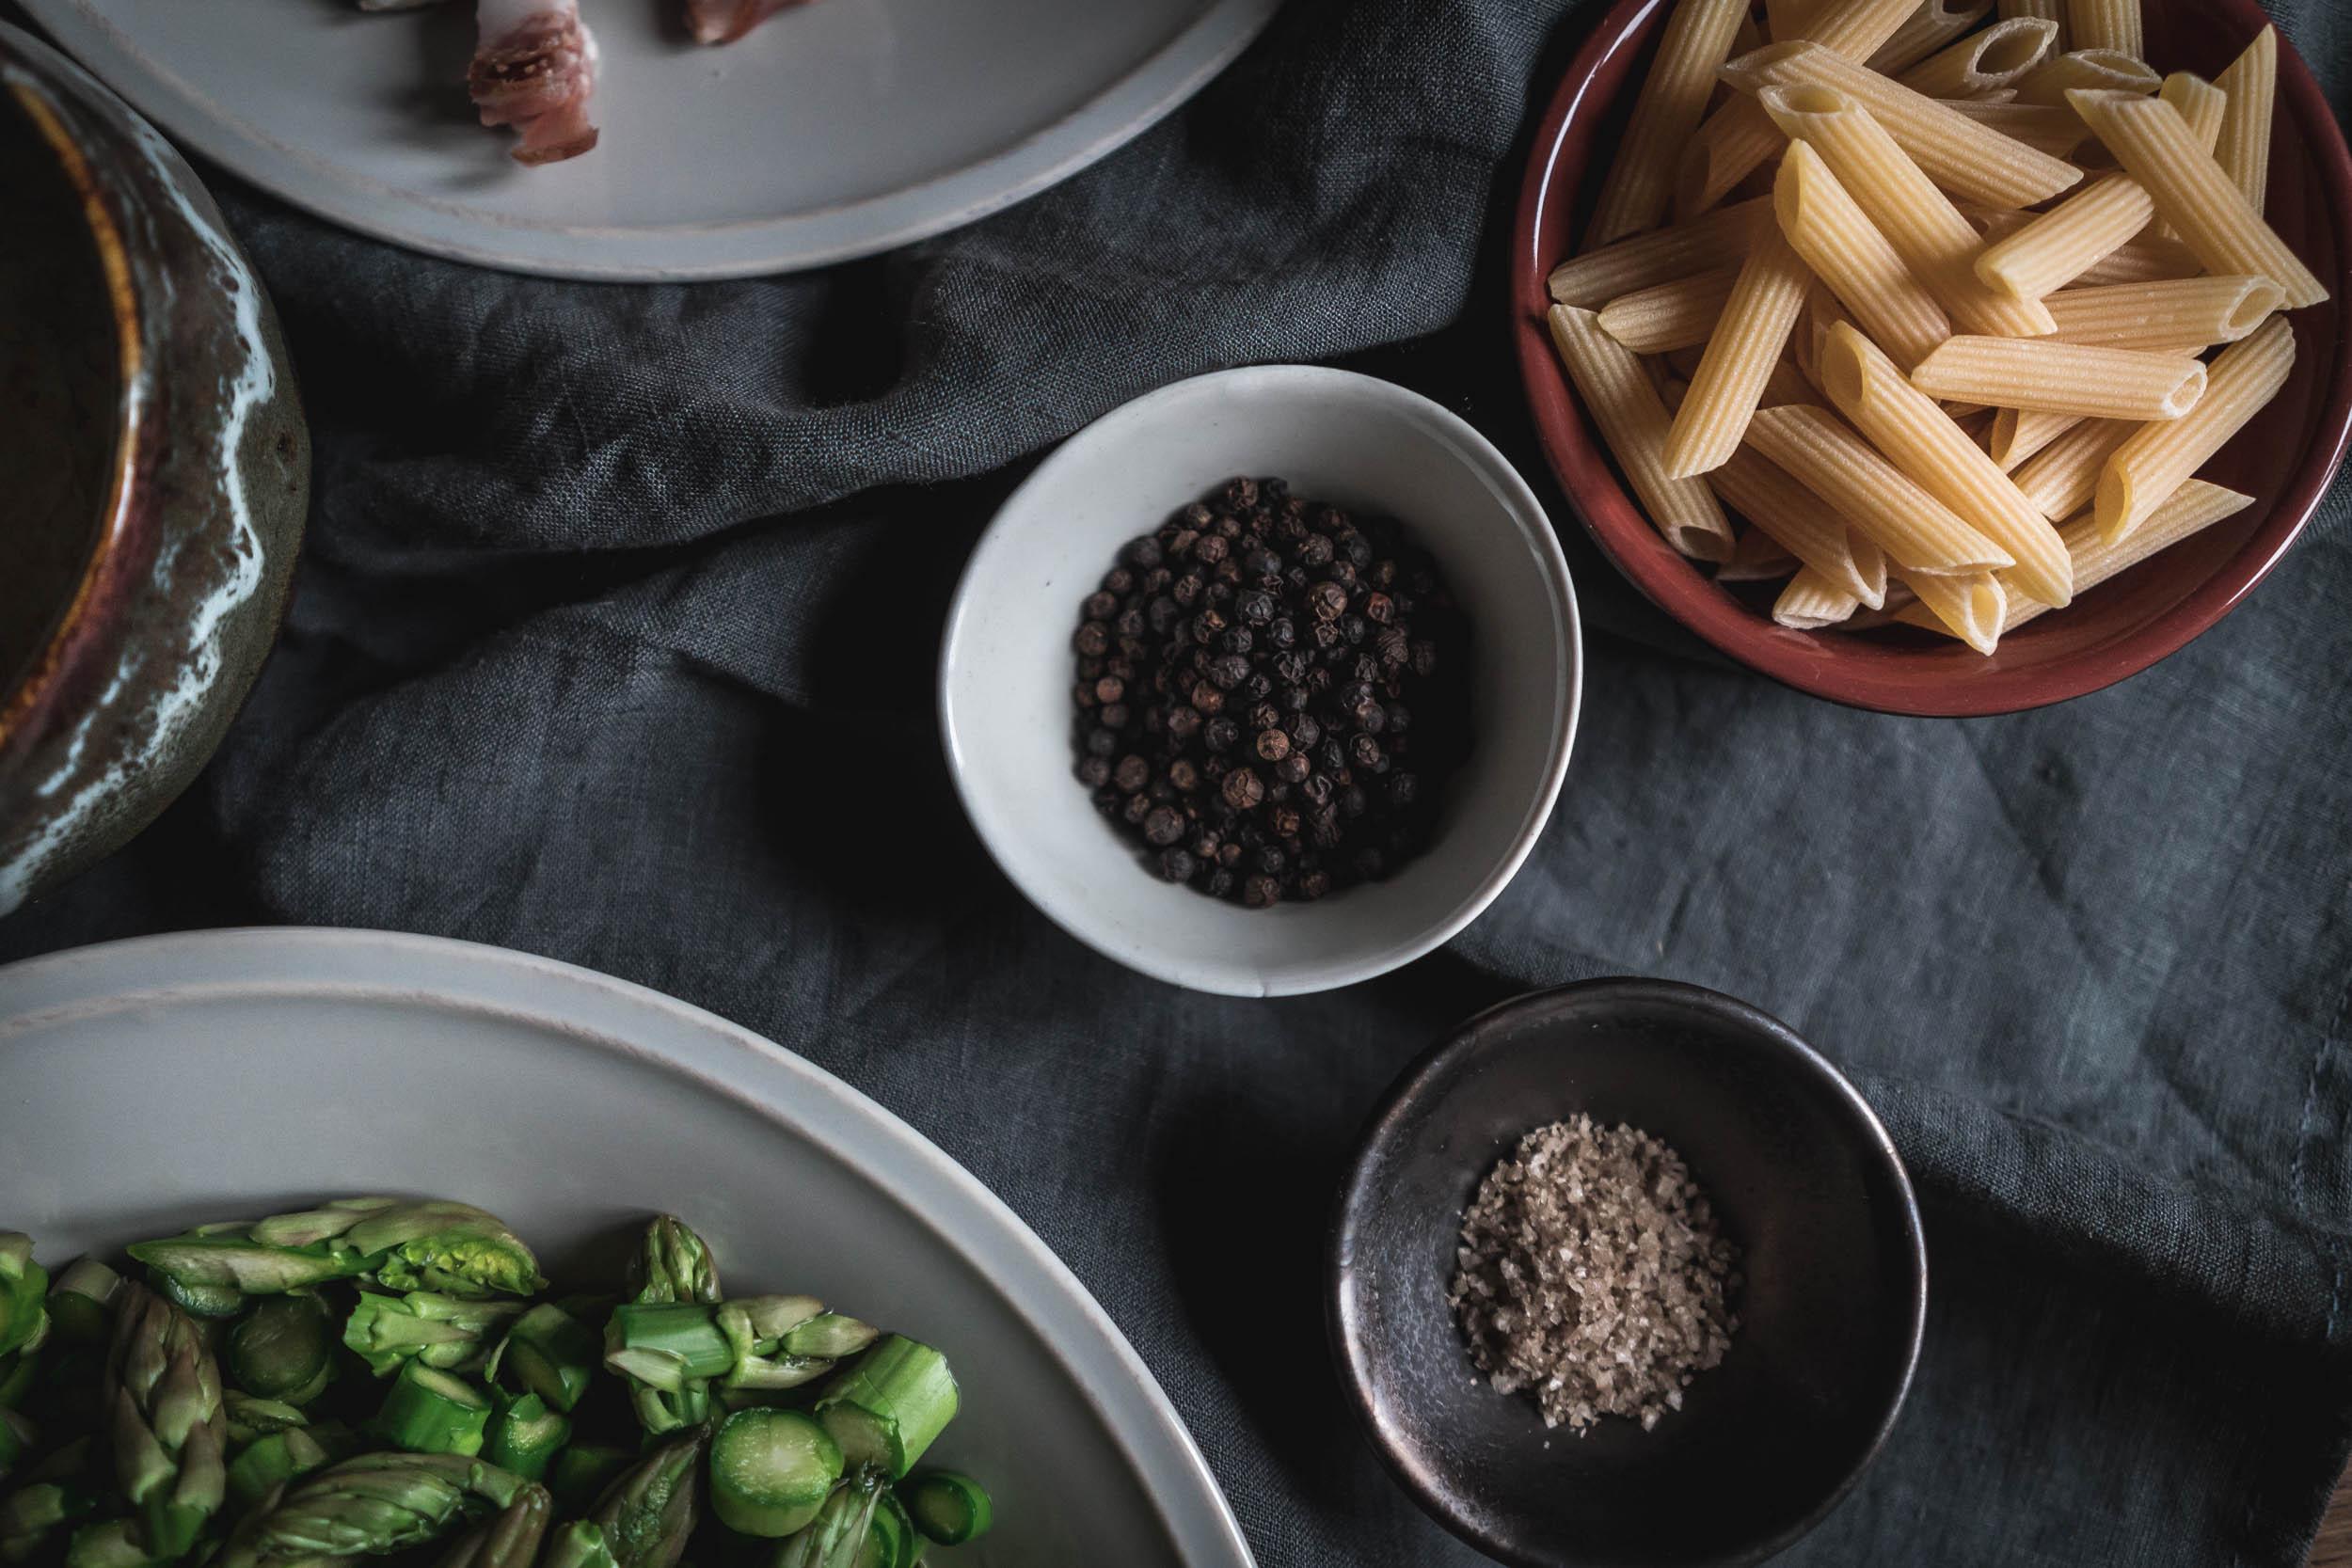 Asparagus-and-Bacon-Penne-Pasta-05104.jpg